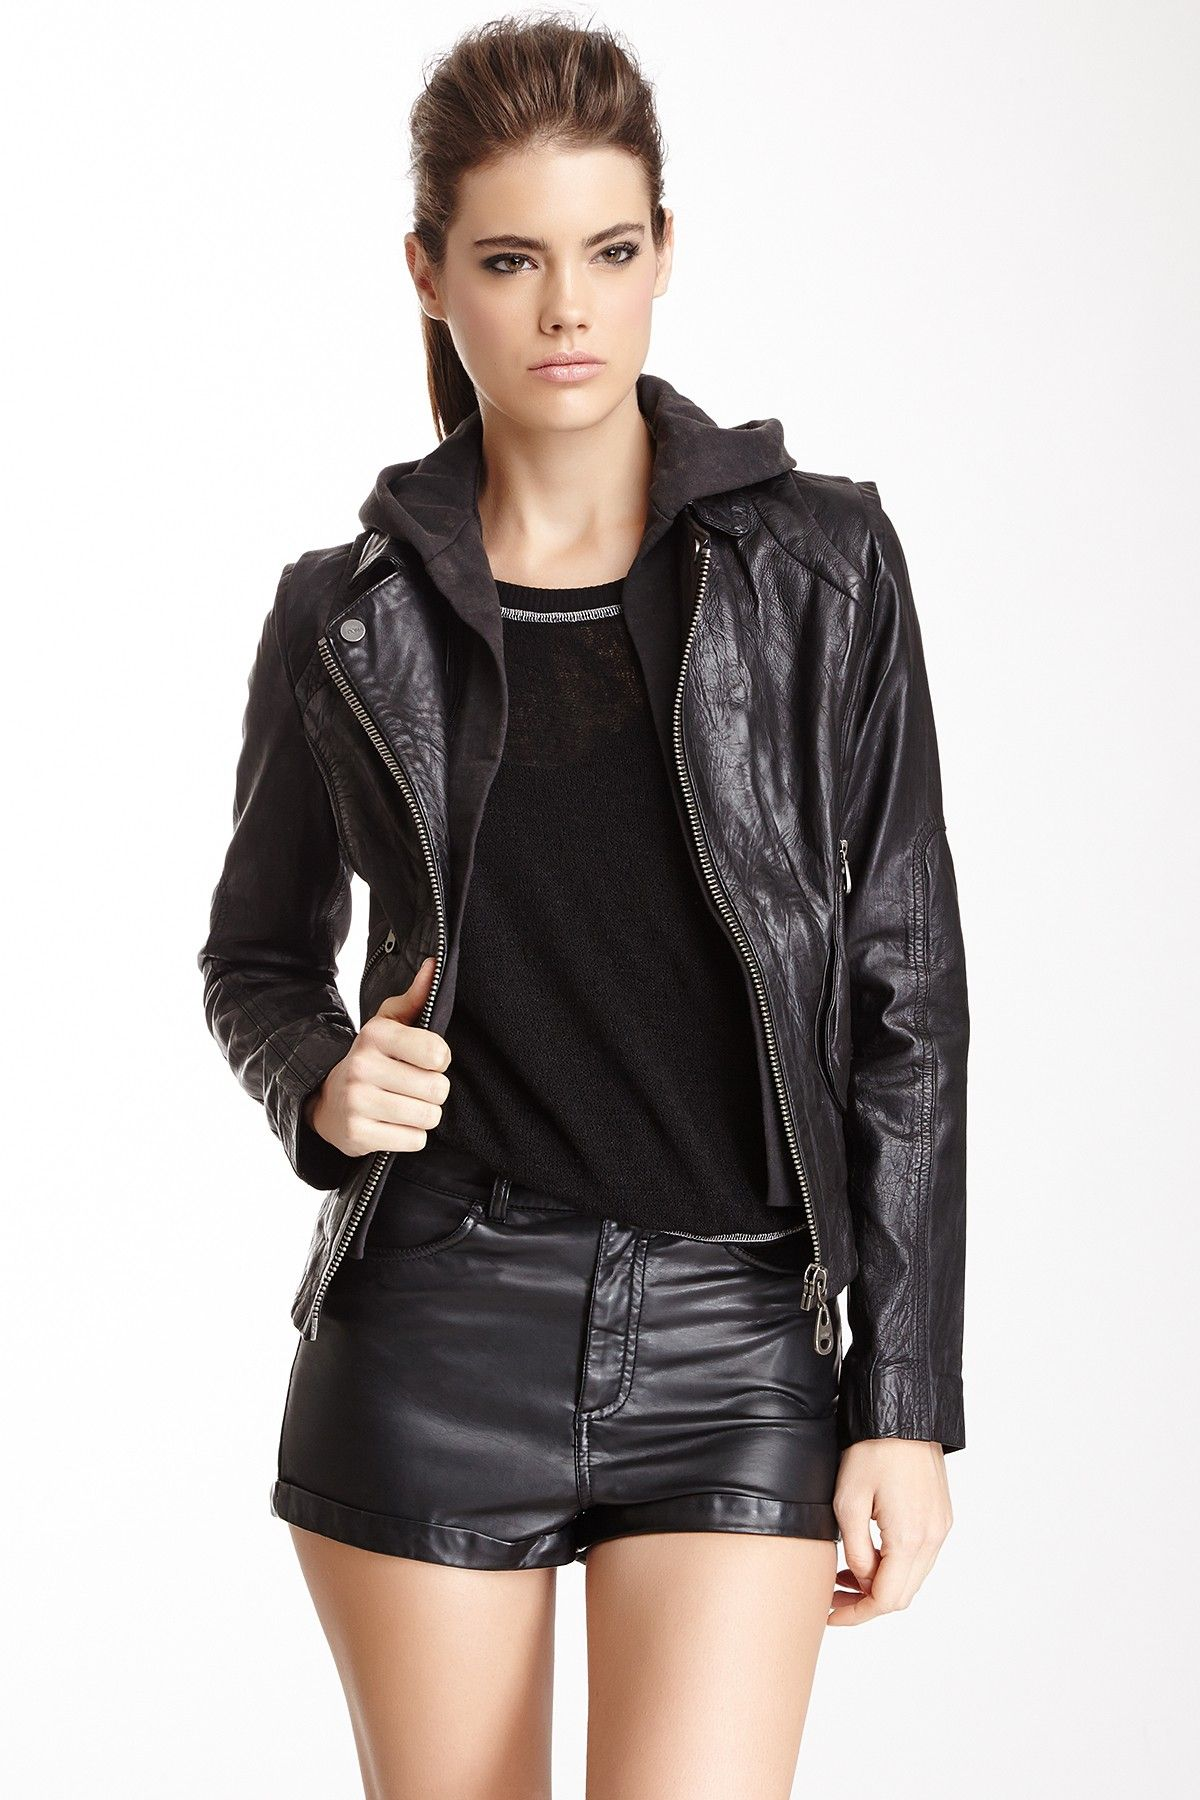 Hooded Leather Jacket Jacket ZipclosureWomen Outerwear